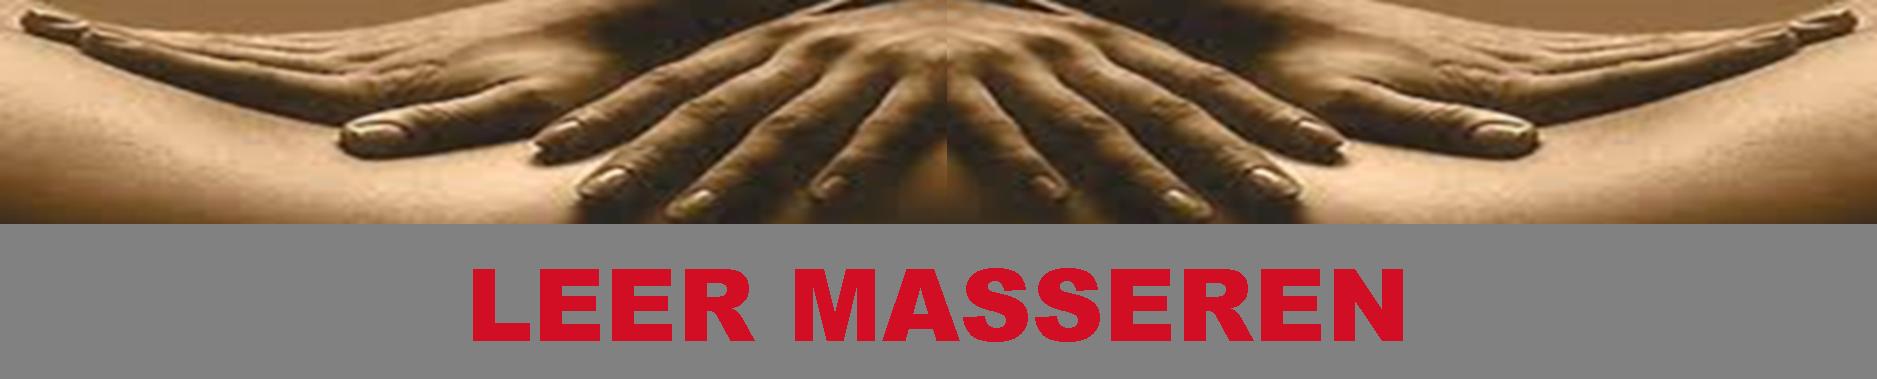 gratis chat site tantra massage cursus